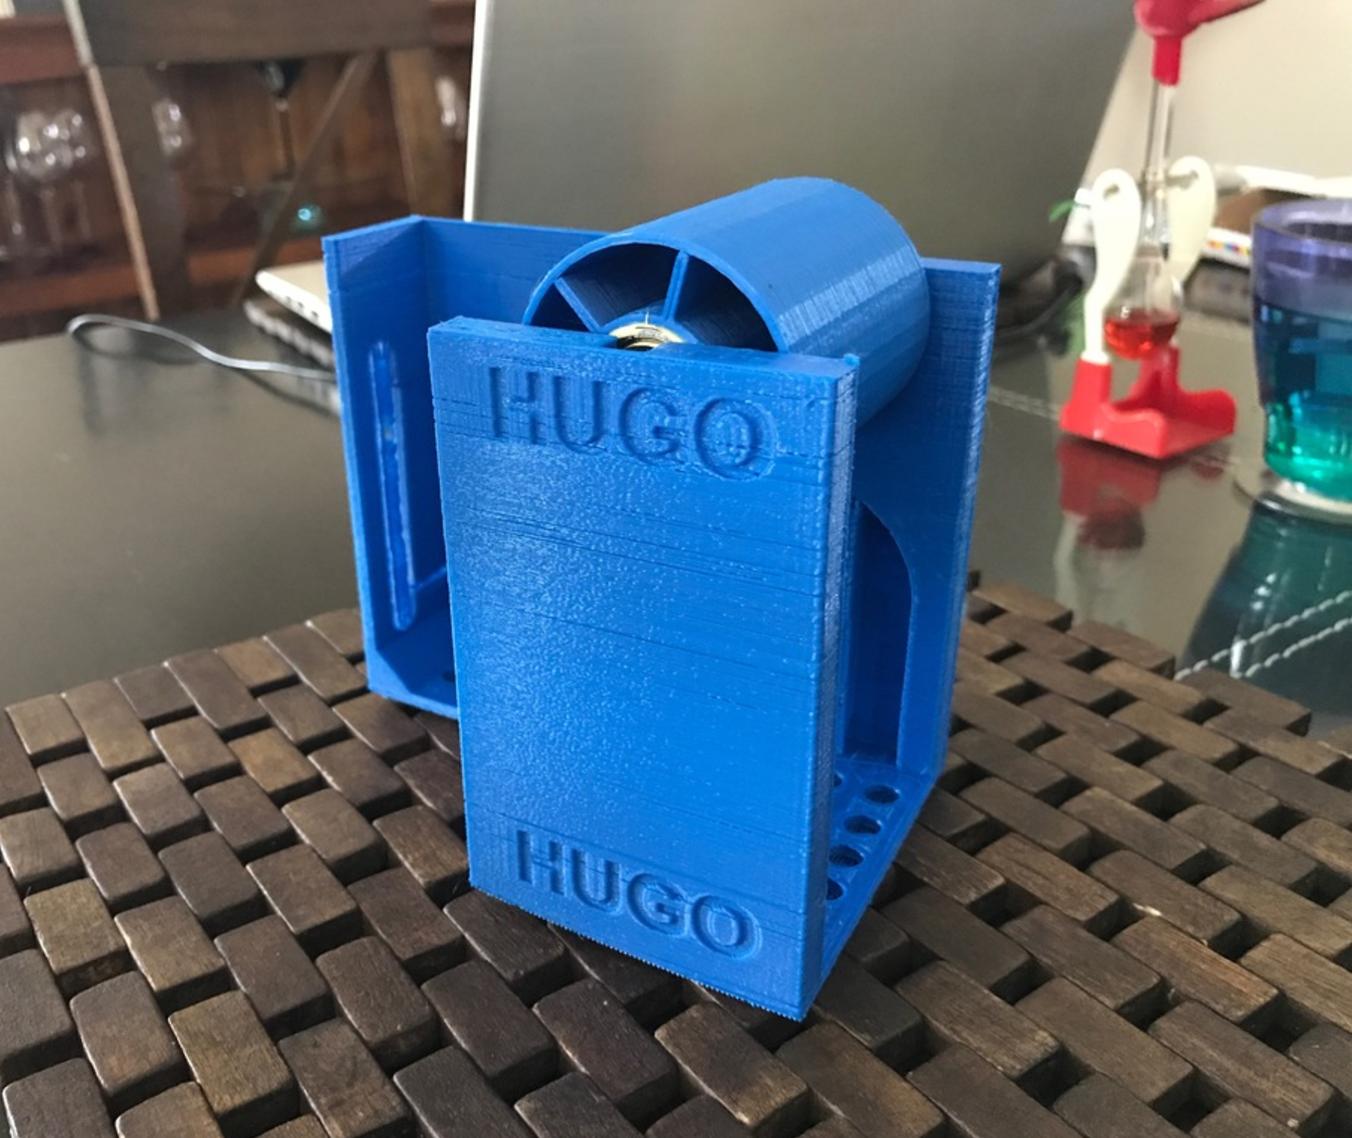 Capture d'écran 2017-06-05 à 09.45.49.png Download free STL file SPOOL HOLDER (BLUEPRINT3D EDITION) • 3D printer object, hugo